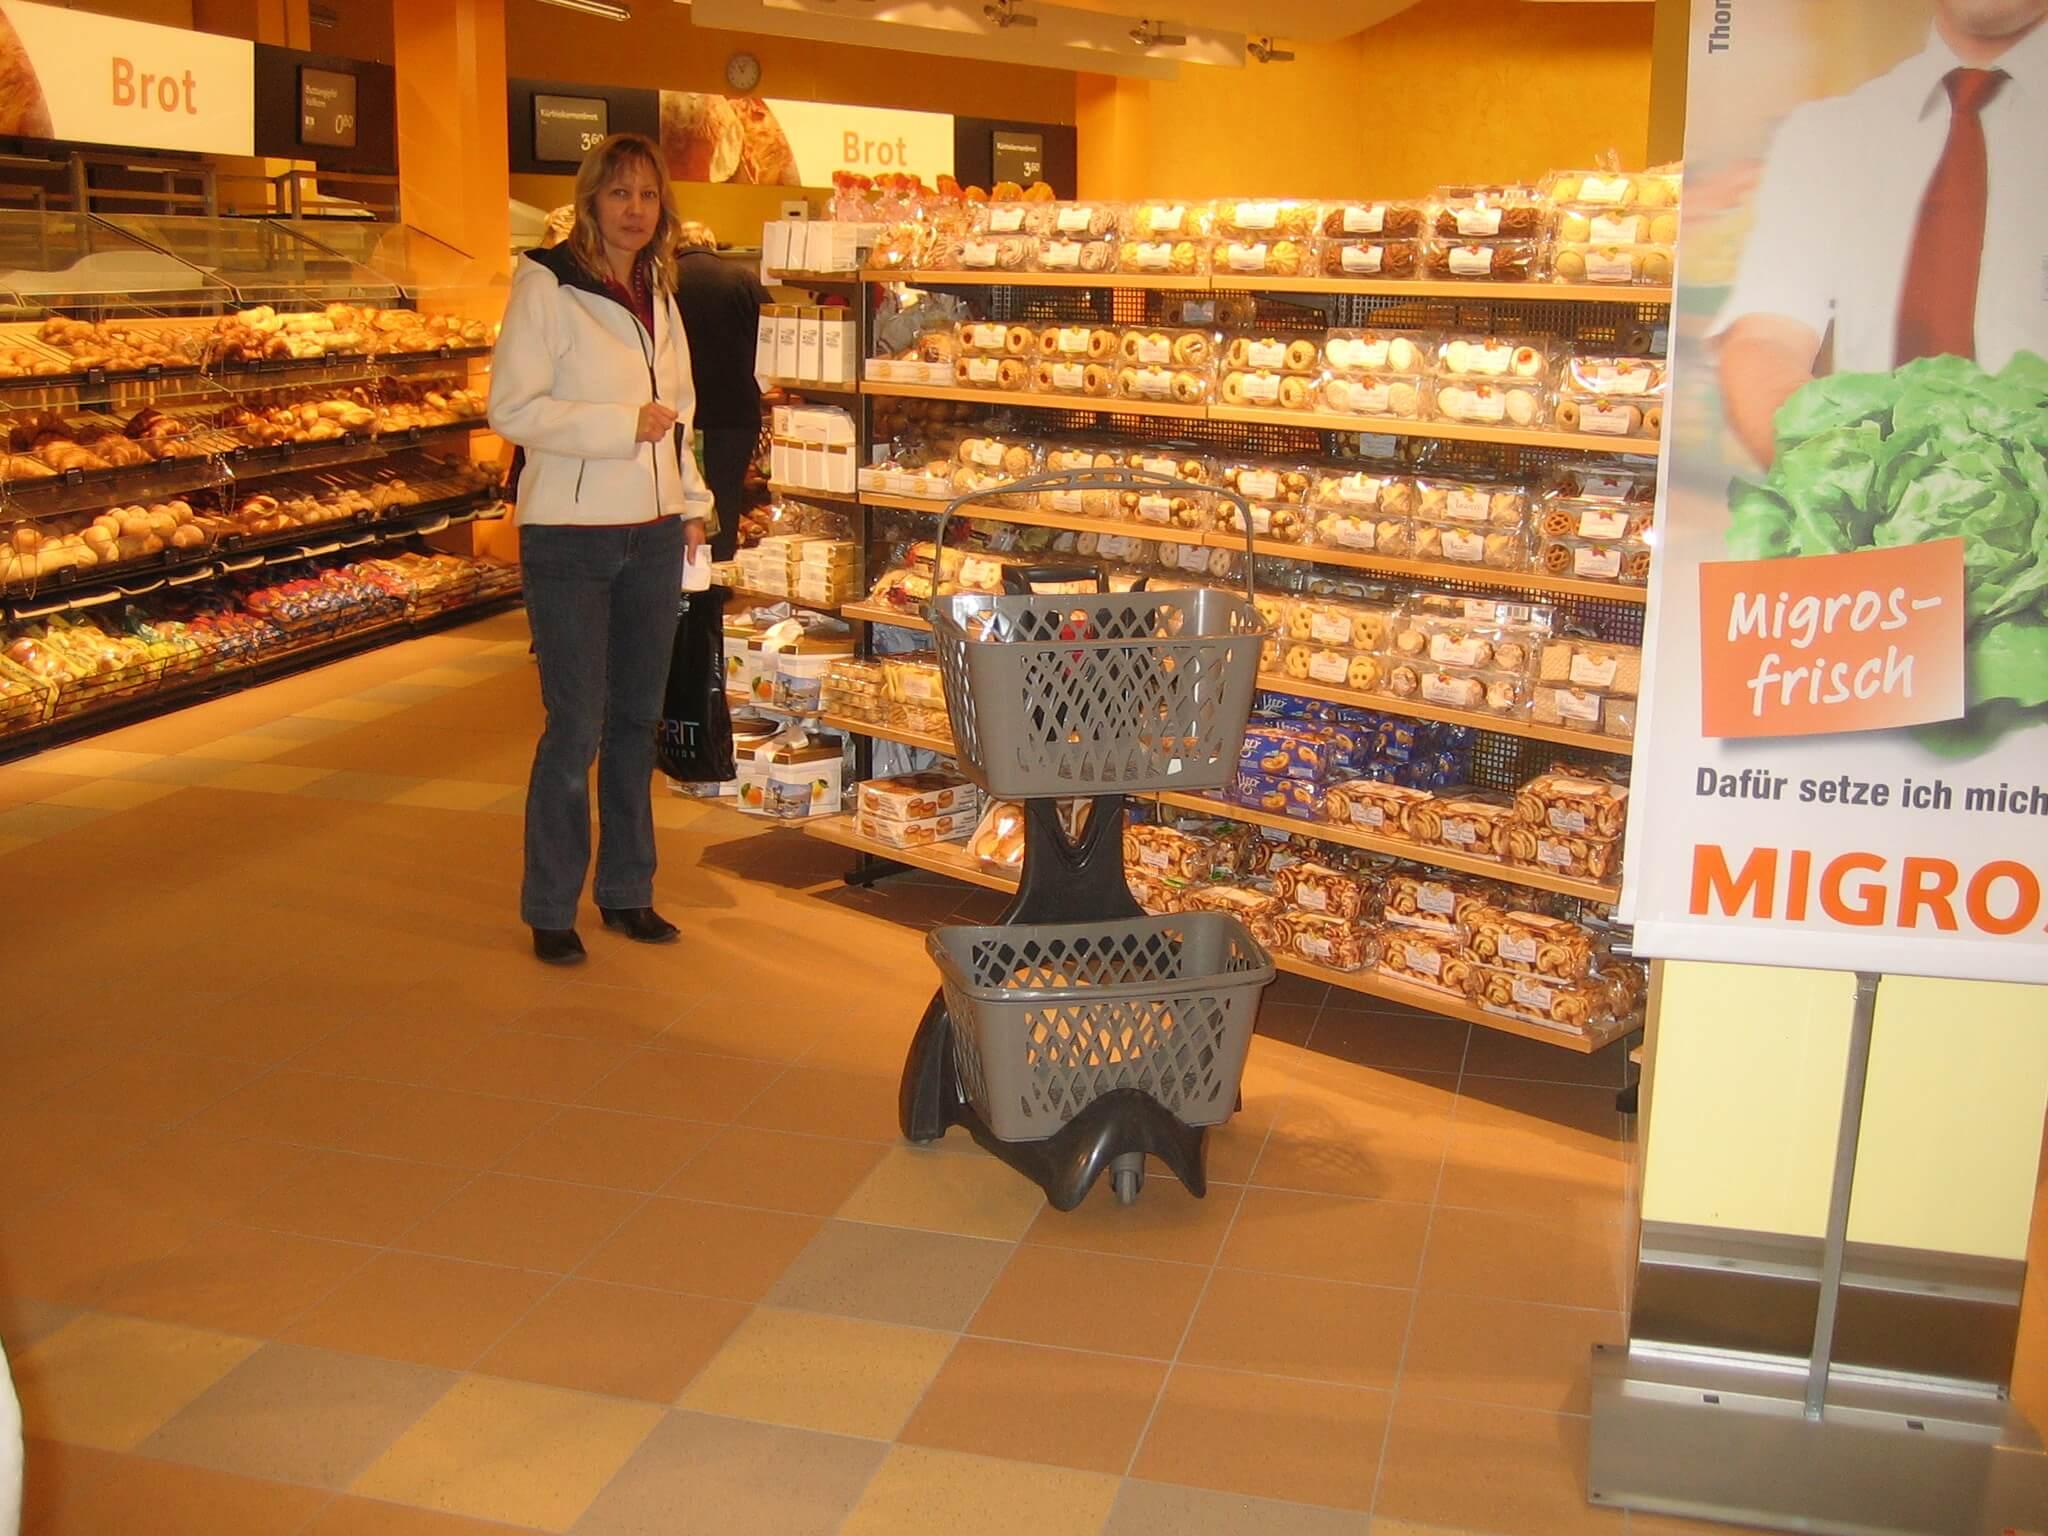 Furbo Double Shopping Basket Holder